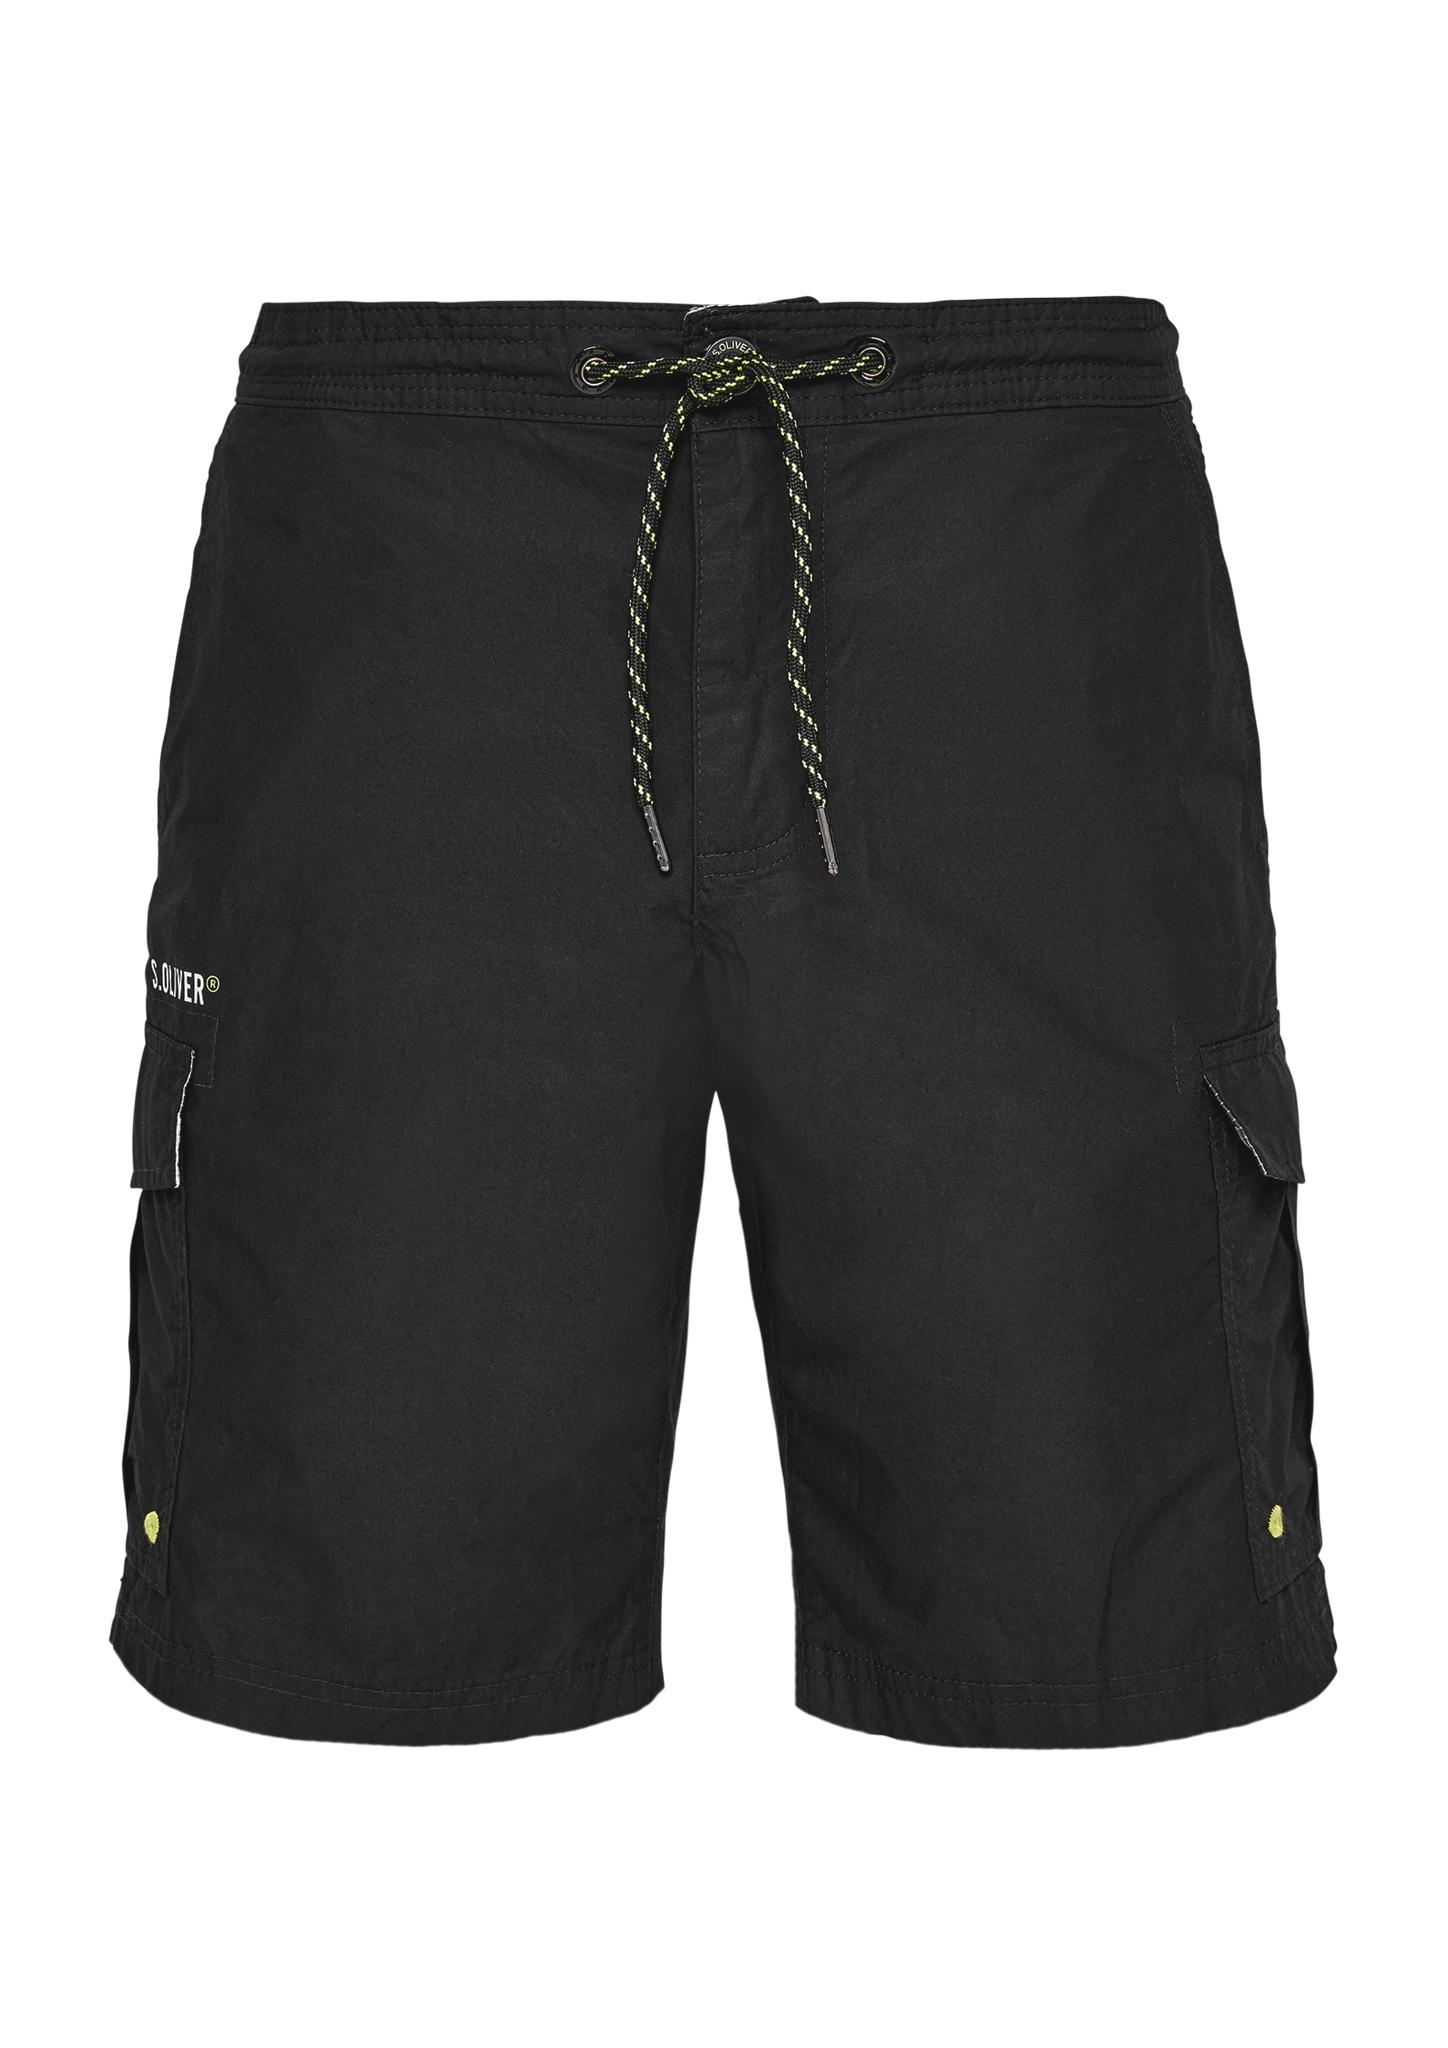 Badeshorts | Bekleidung > Bademode > Badeshorts | Grau/schwarz | Obermaterial 100% baumwolle| futter 100% polyester | s.Oliver